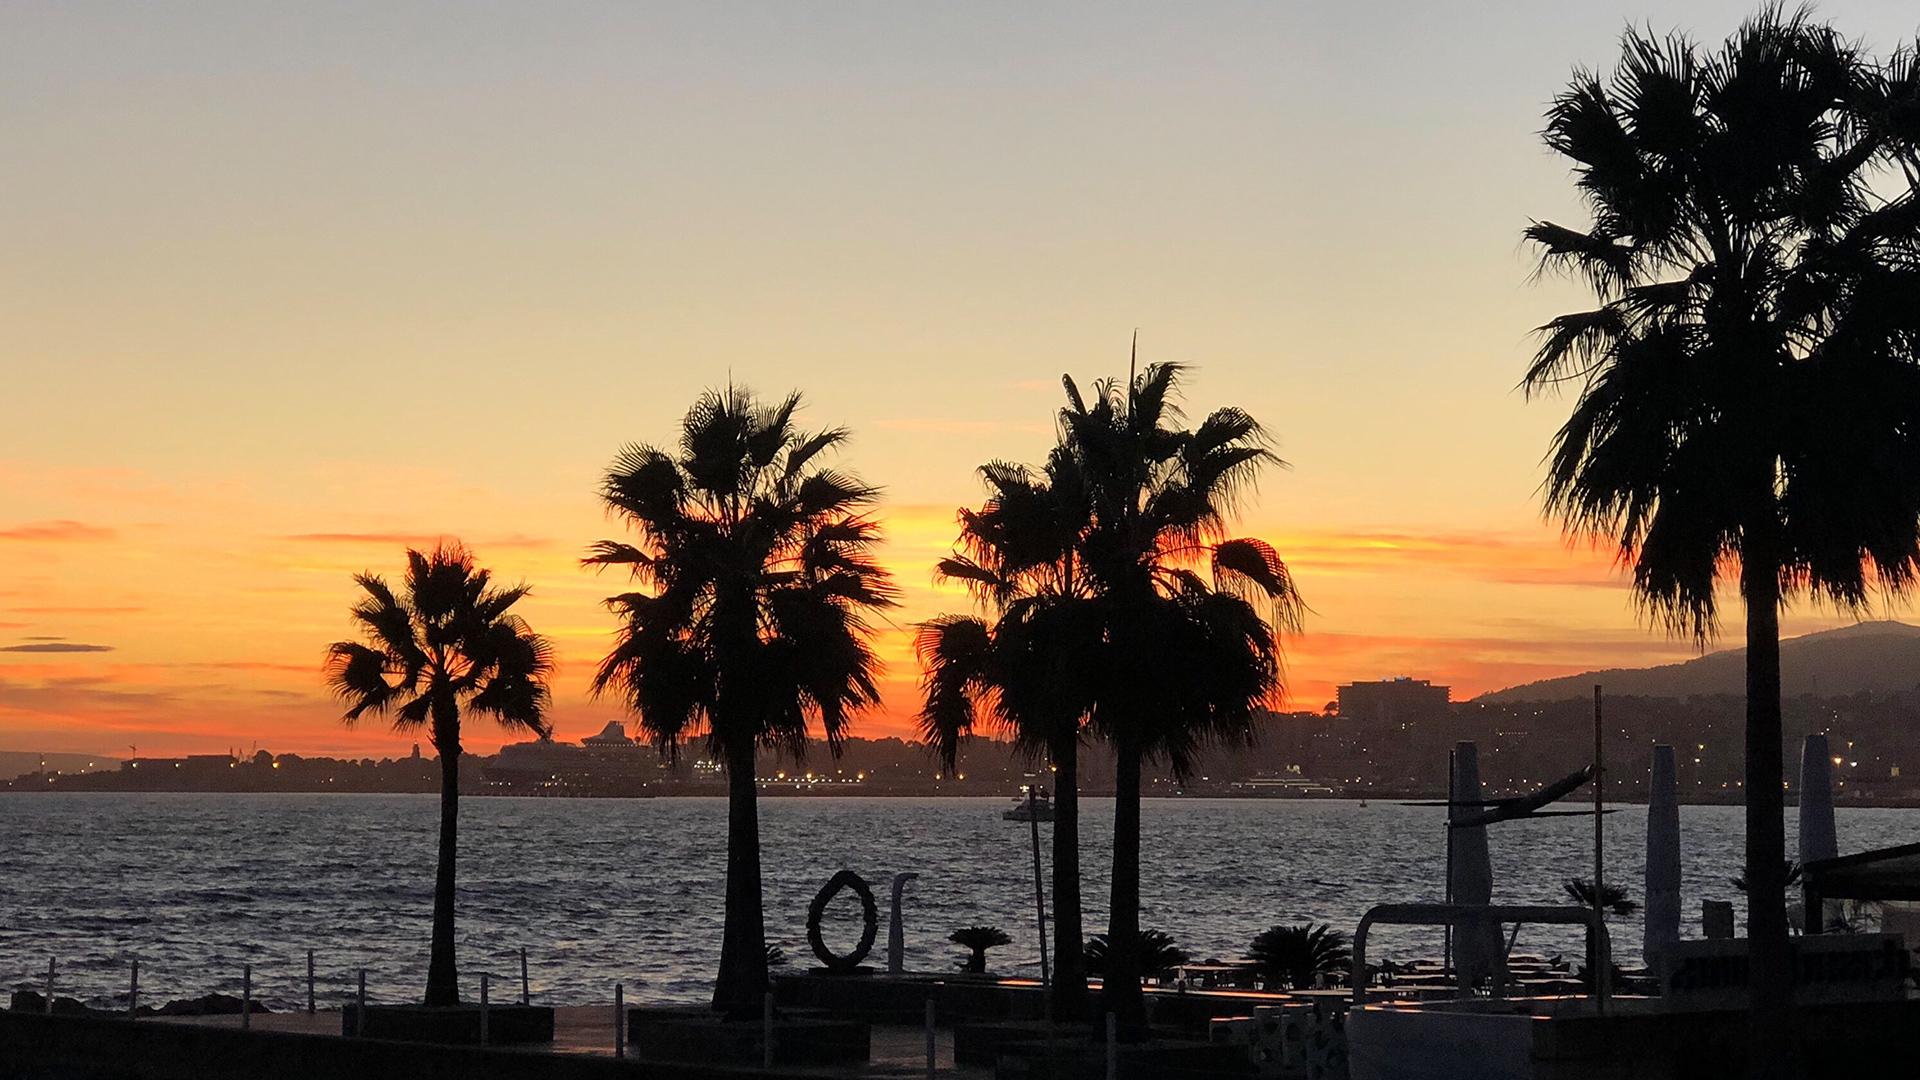 Sunset palmtrees palma beach Photo Adele Chretien